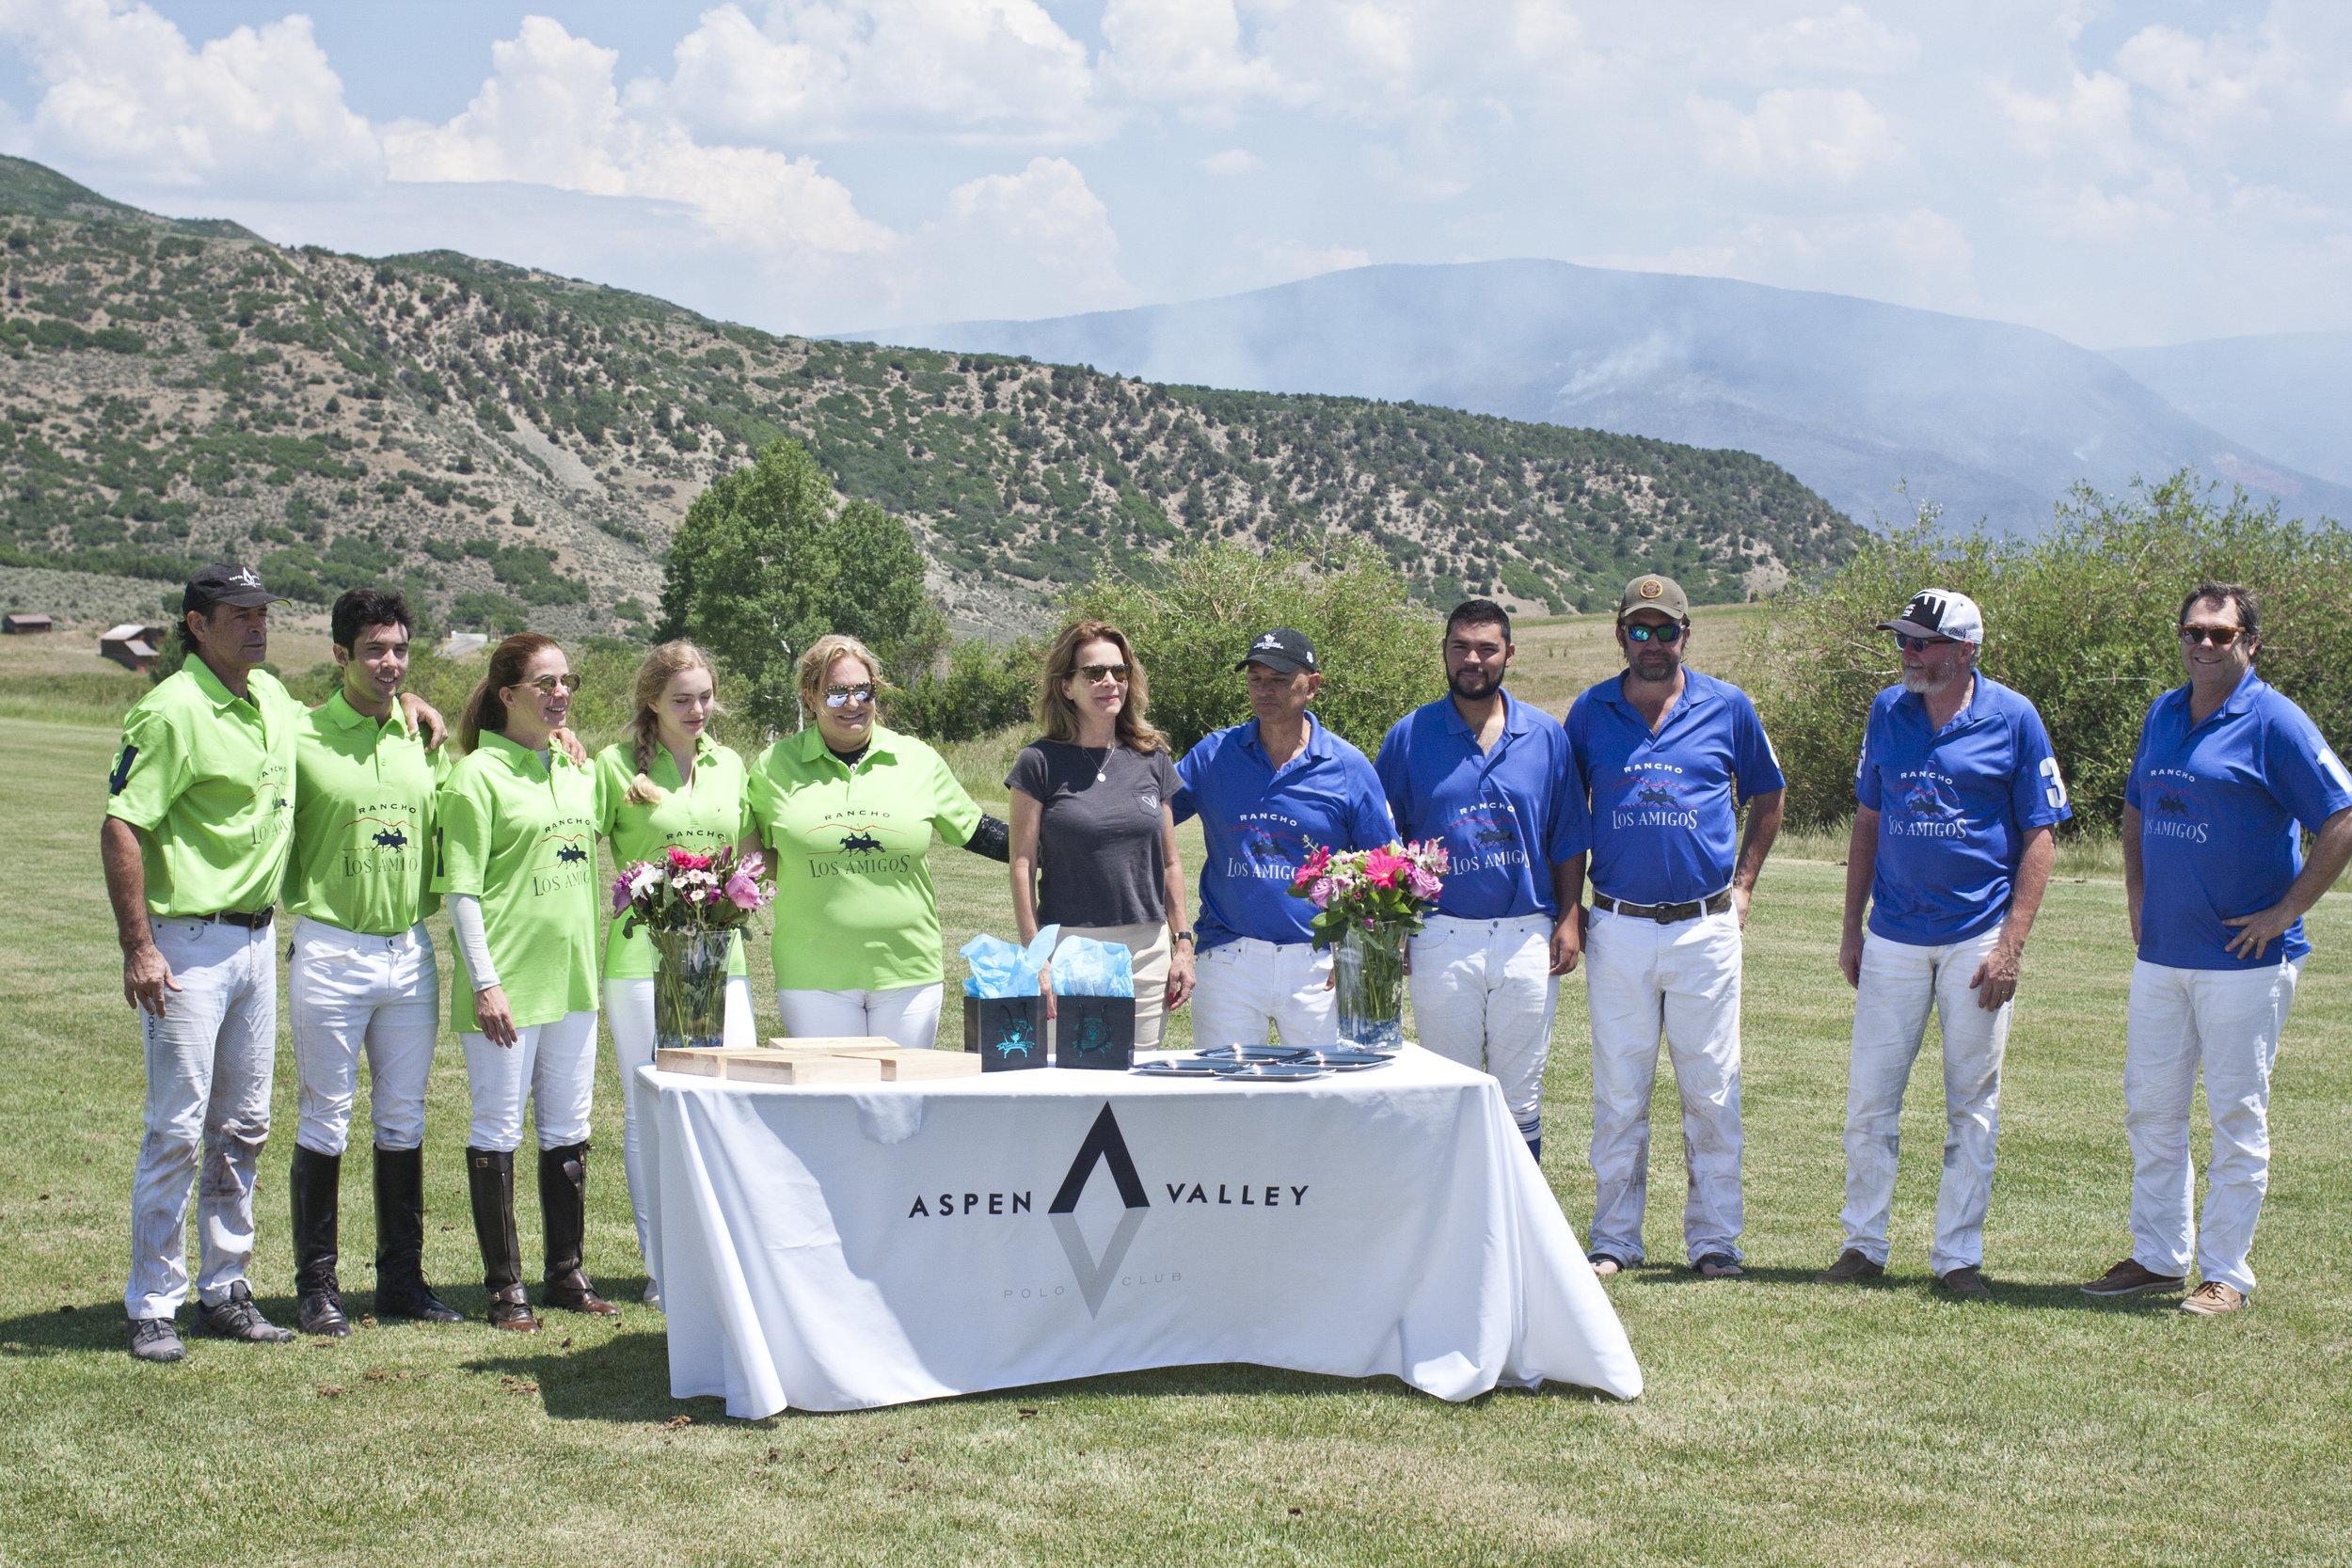 Aspen Cup winners Los Amigos Green and runners-up Los Amigos Blue.